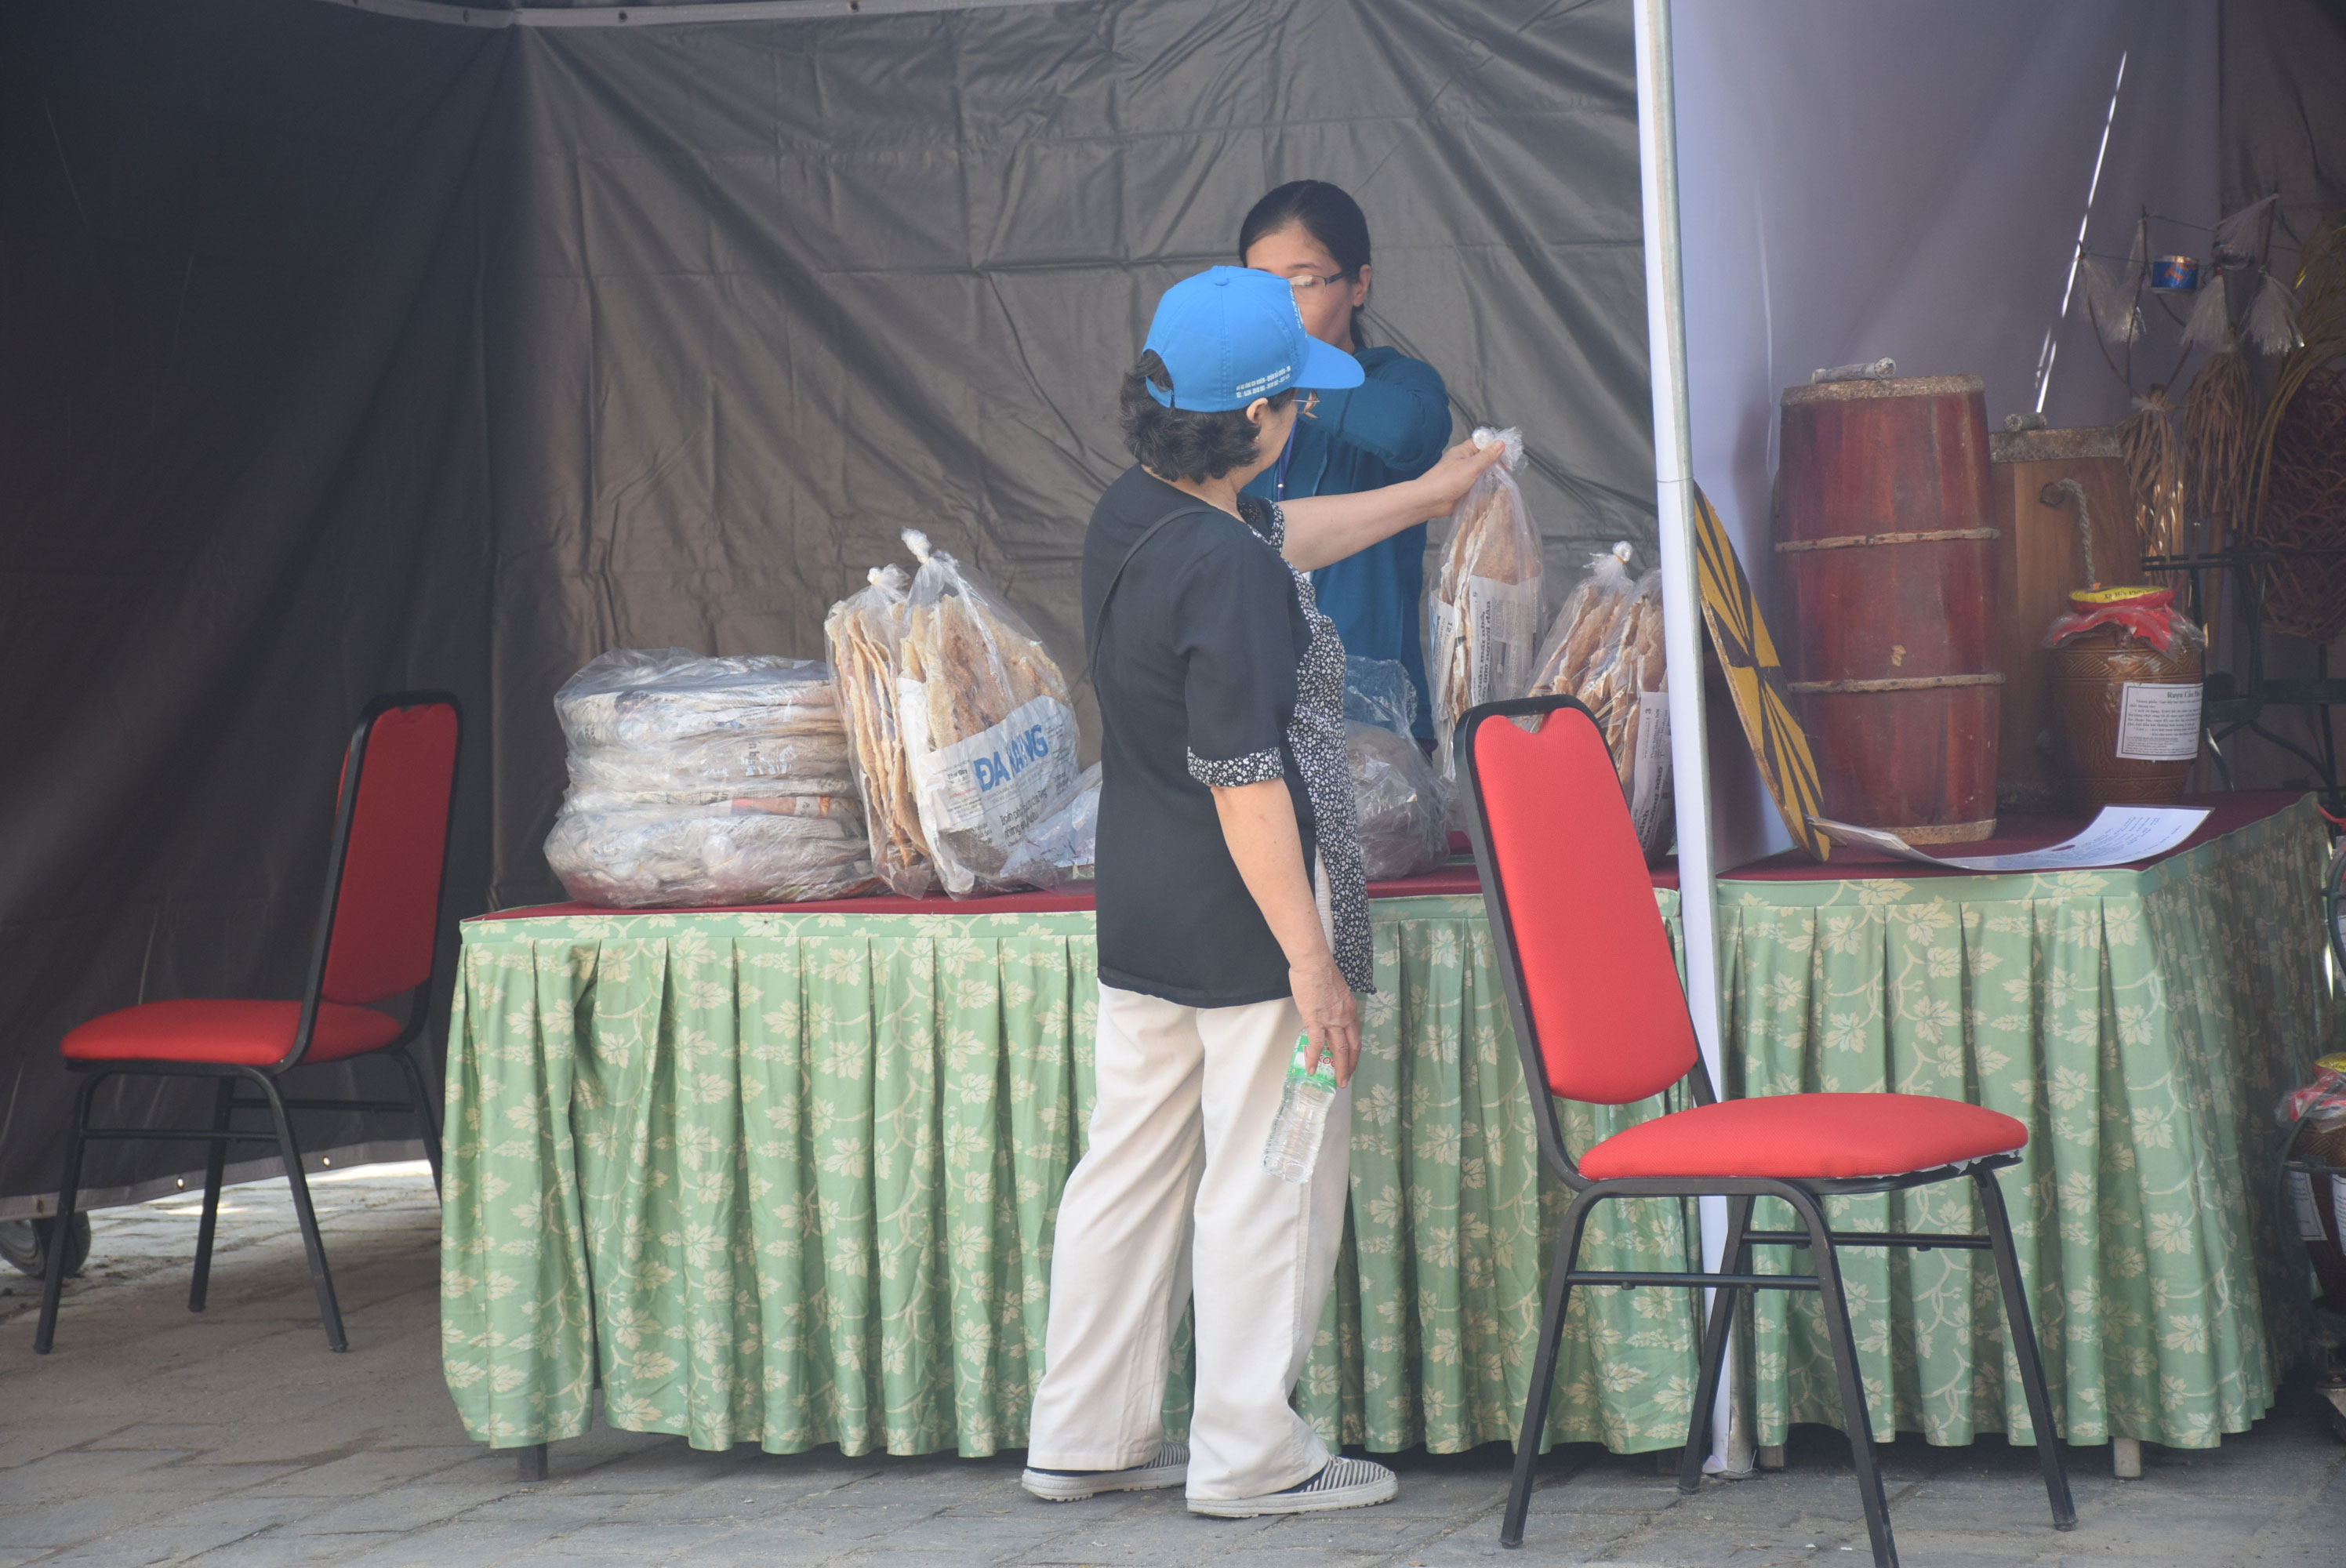 Le hoi lien hoang lang nghe xu quang 2017 - 3